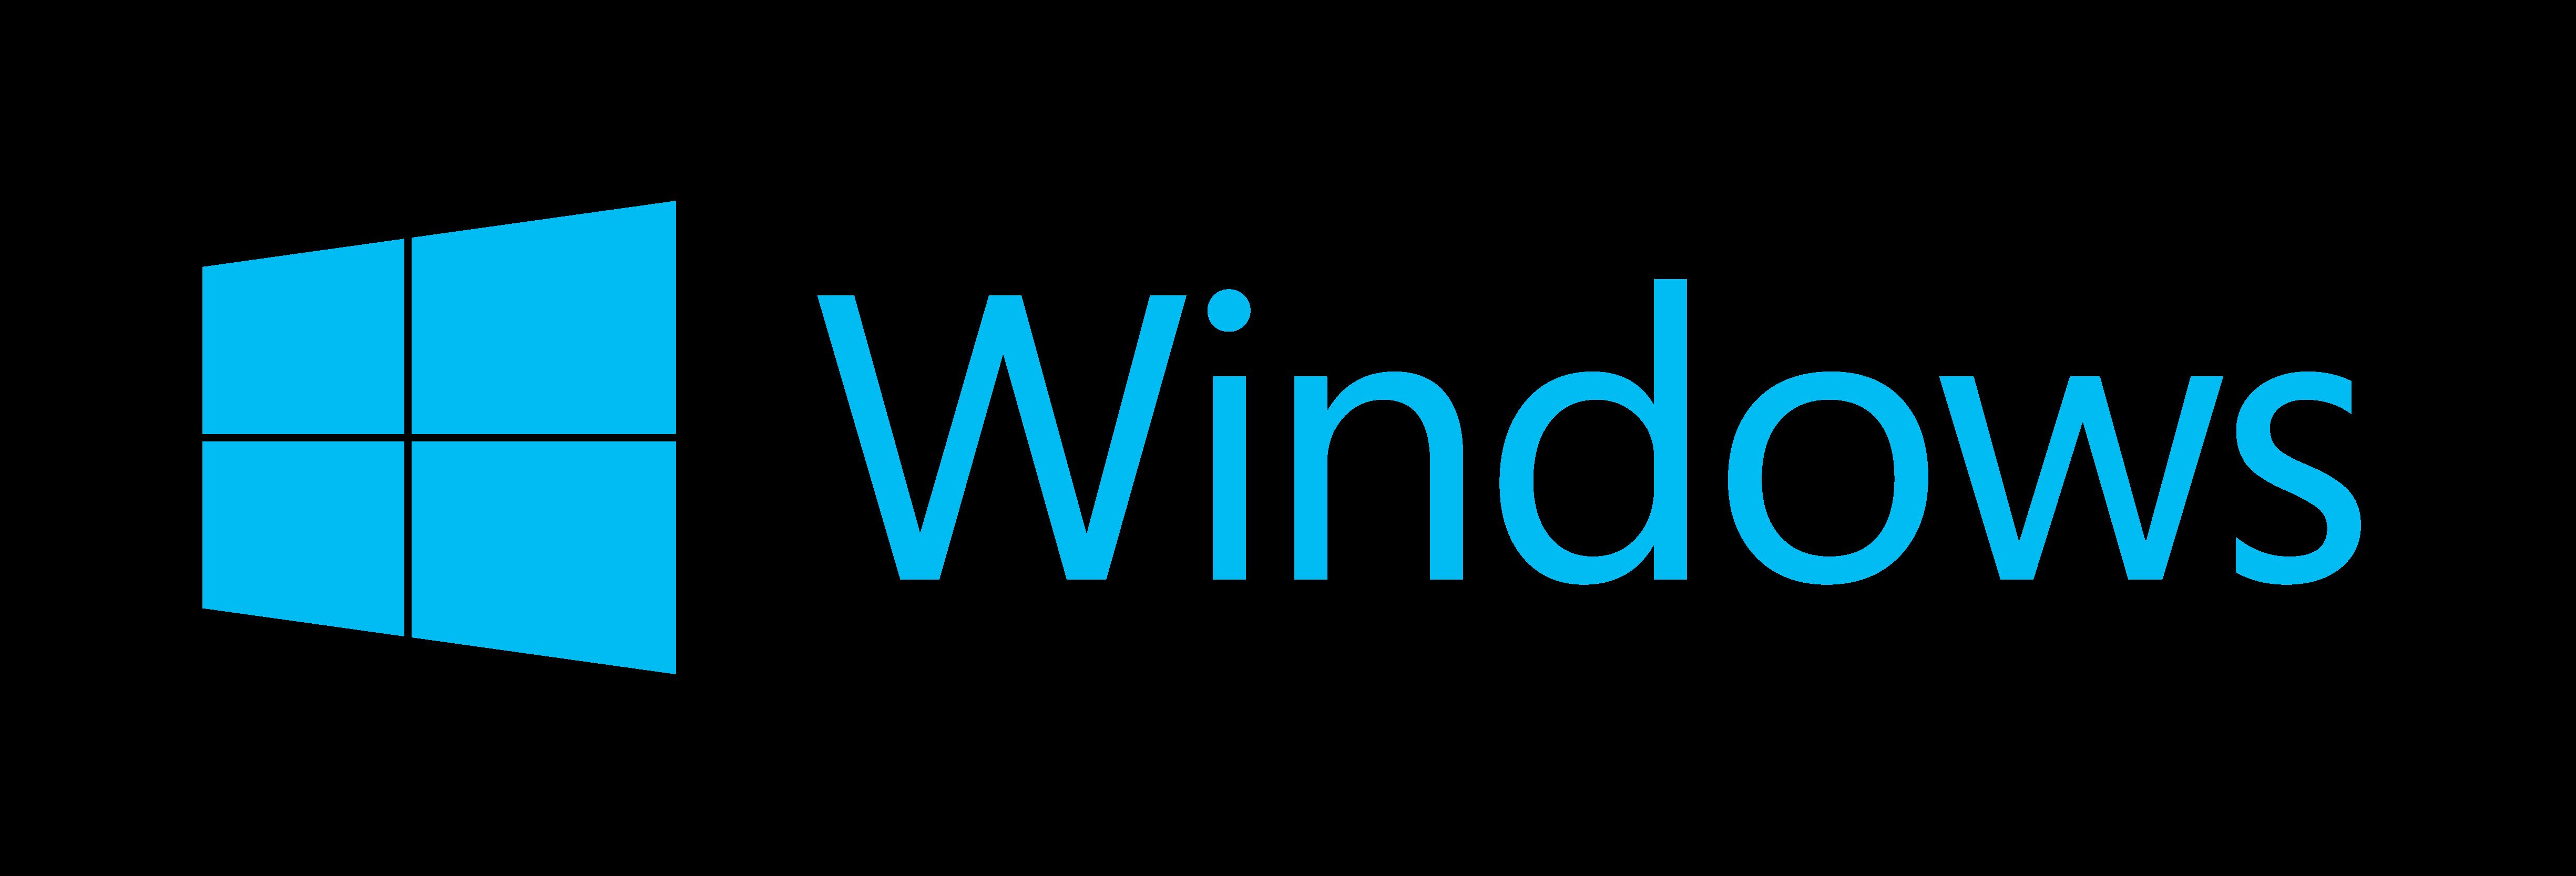 Licenze Microsoft Windows gratis